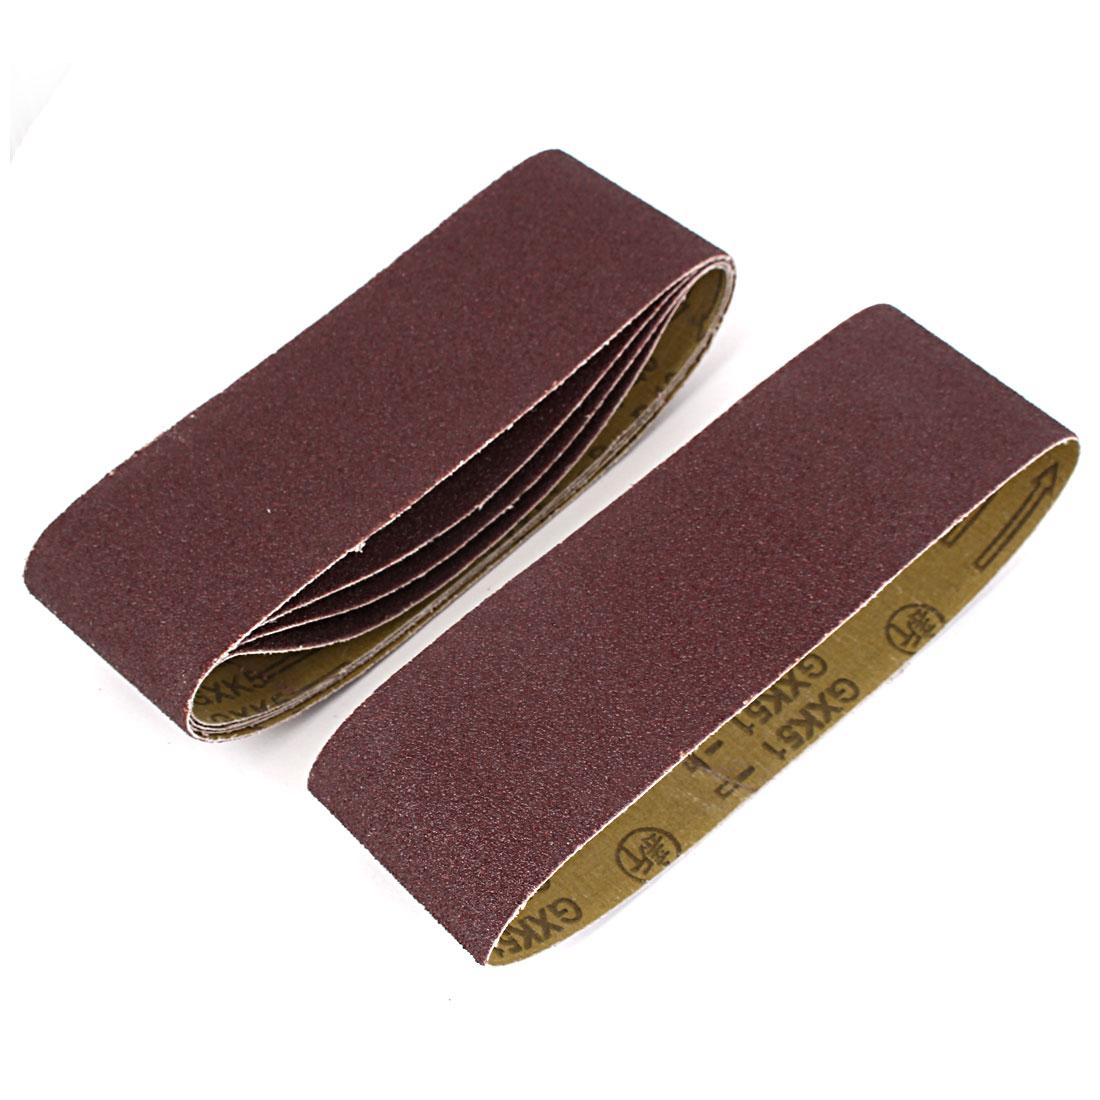 533mmx75mm 40 Grit Abrasive Sanding Belt Sandpaper 5pcs